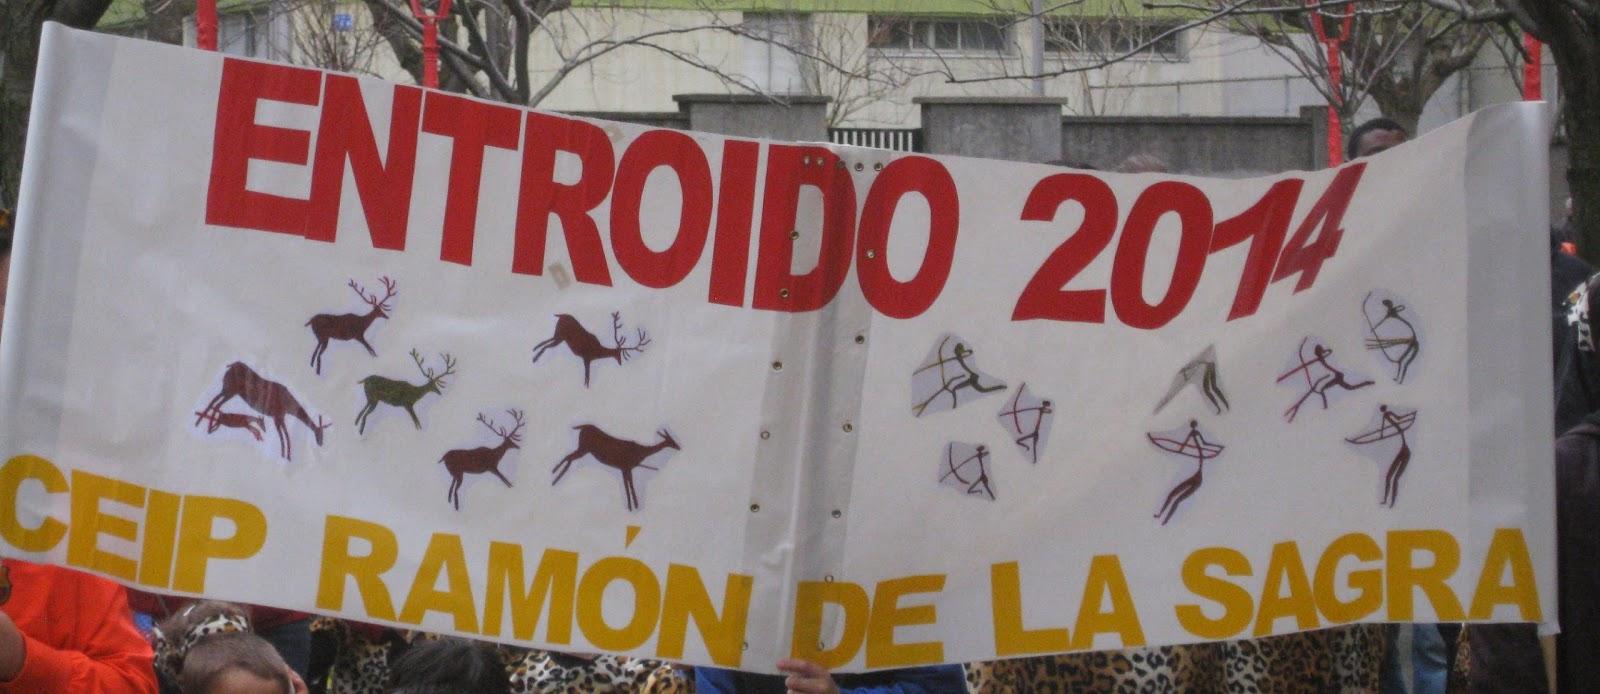 http://ceipramondelasagra.blogspot.com.es/2014/03/entroido-2014.html